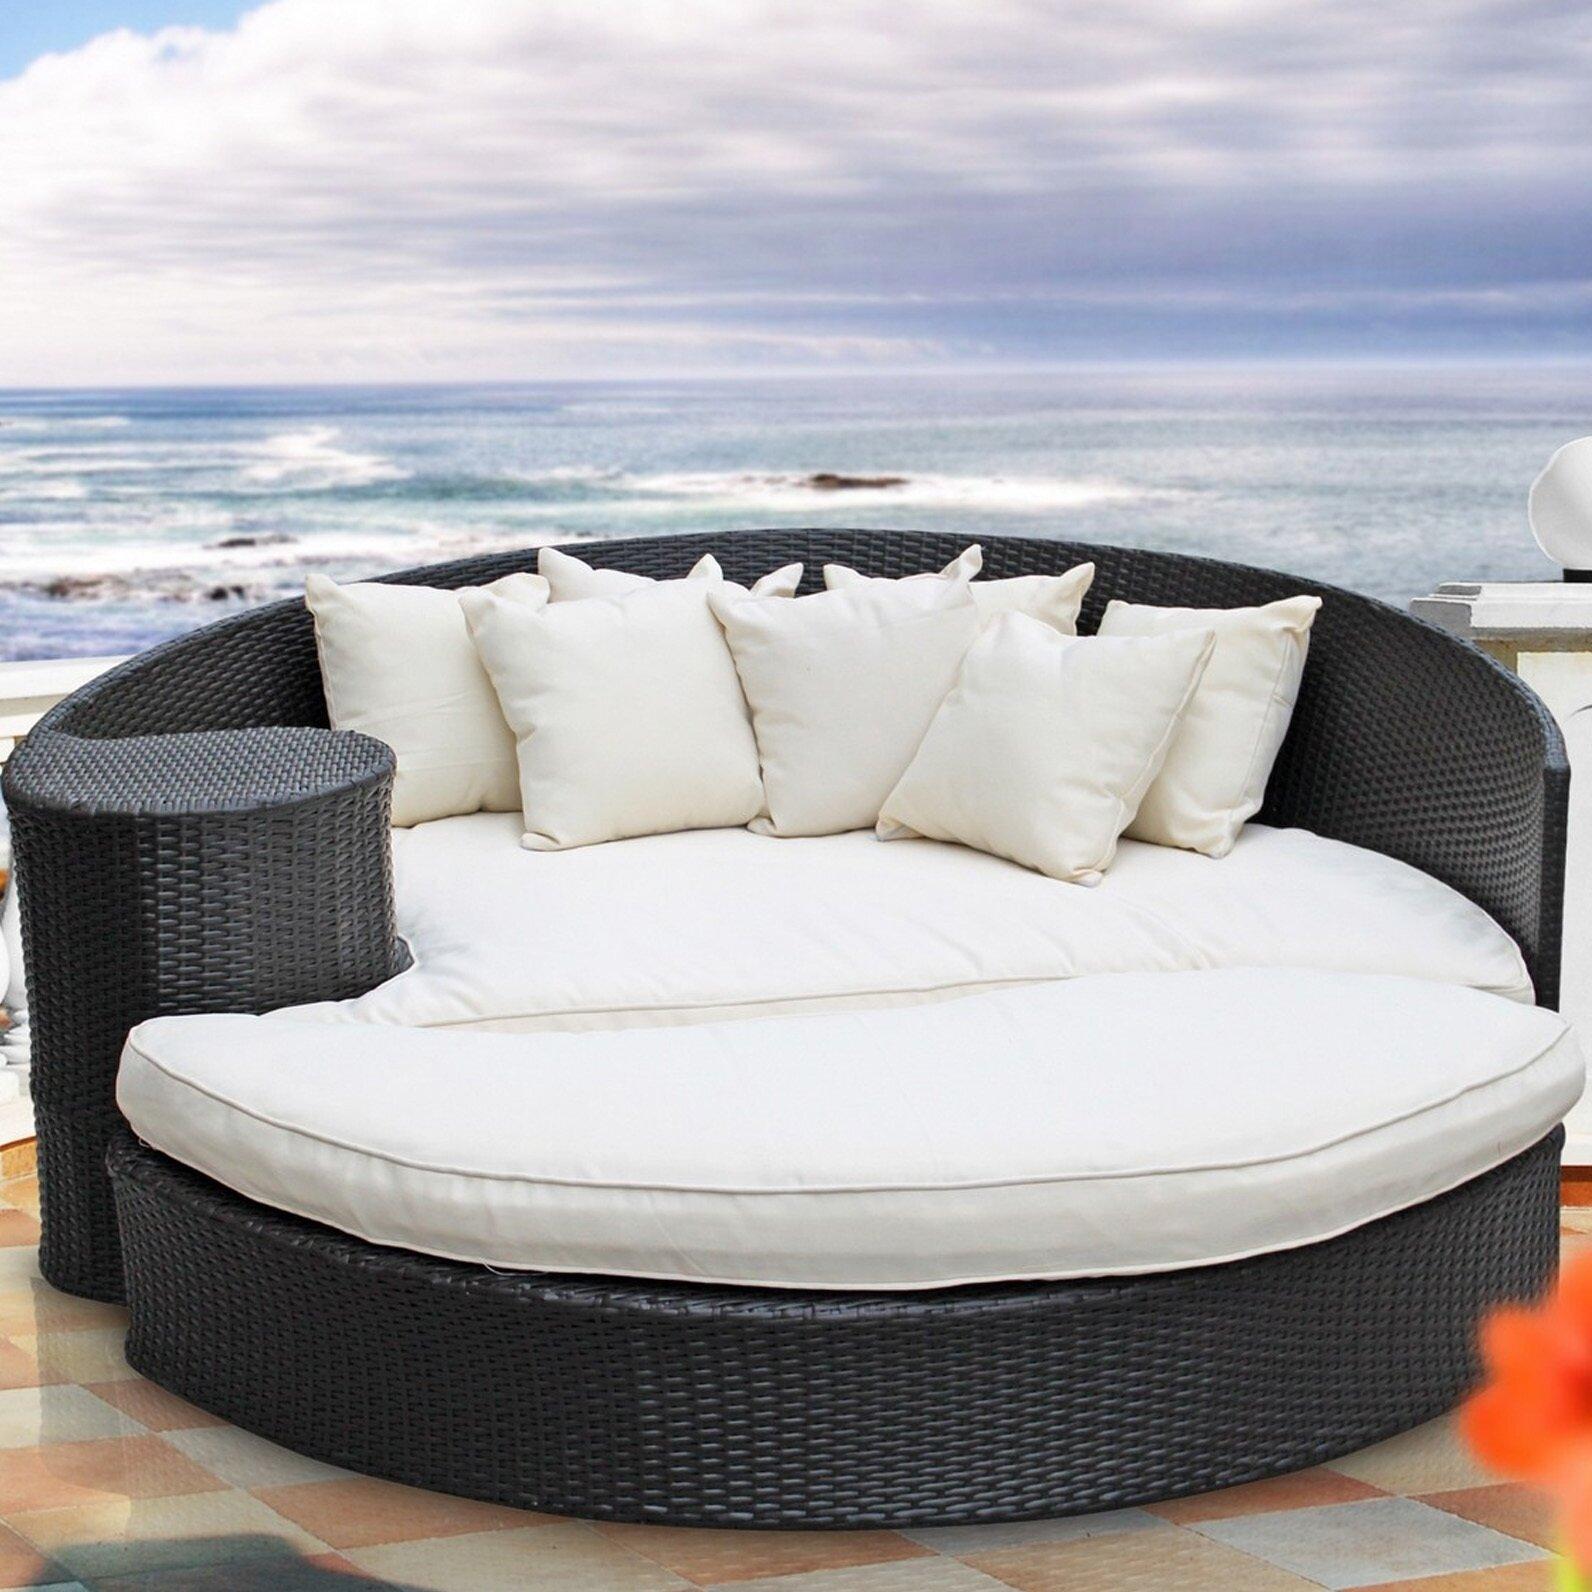 Brayden Studio Greening Outdoor Daybed With Ottoman U0026 Cushions U0026 Reviews |  Wayfair